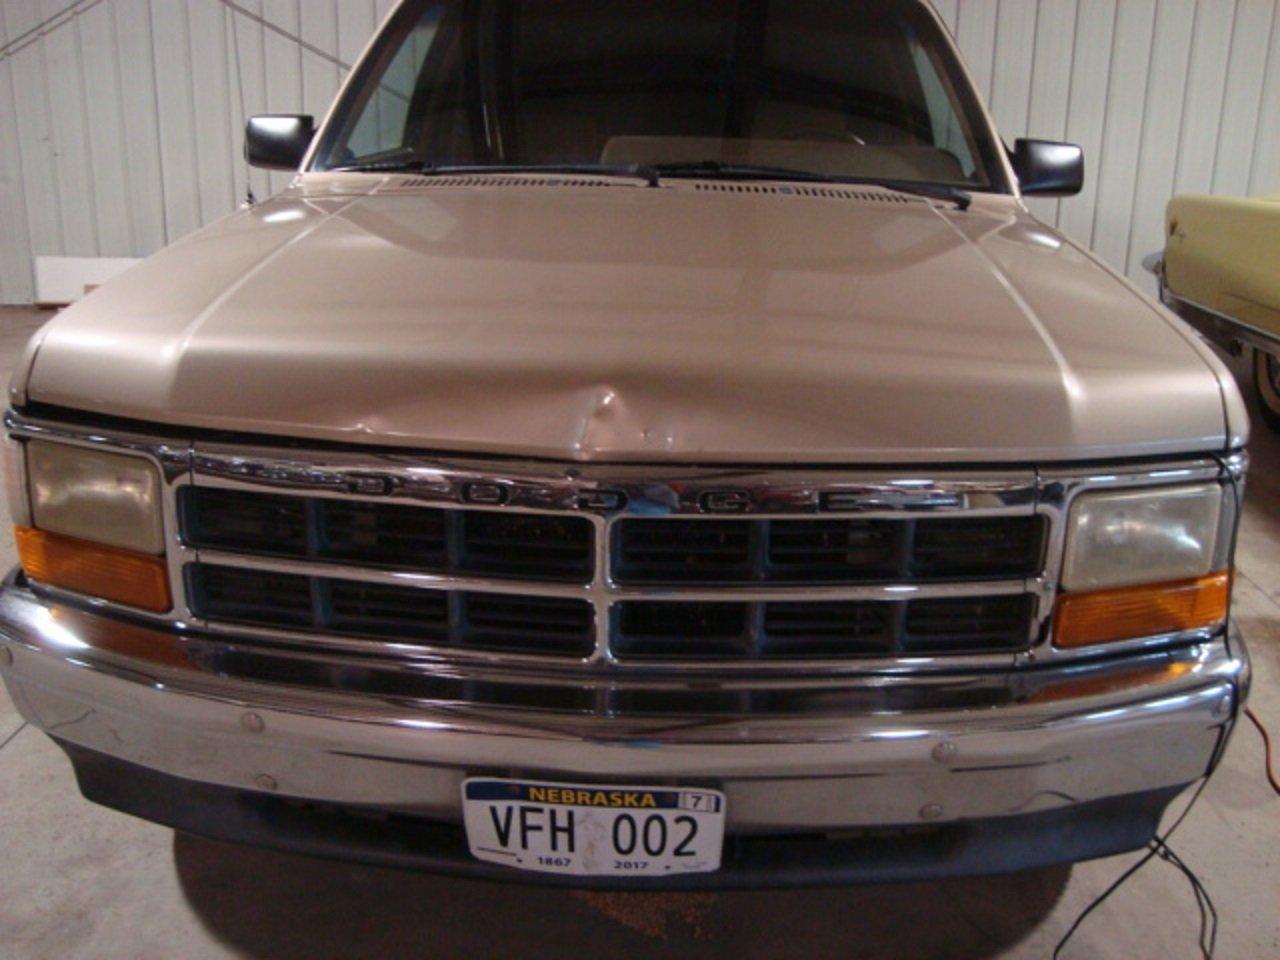 1992 Dodge Dakota Pickup For Sale (picture 4 of 6)